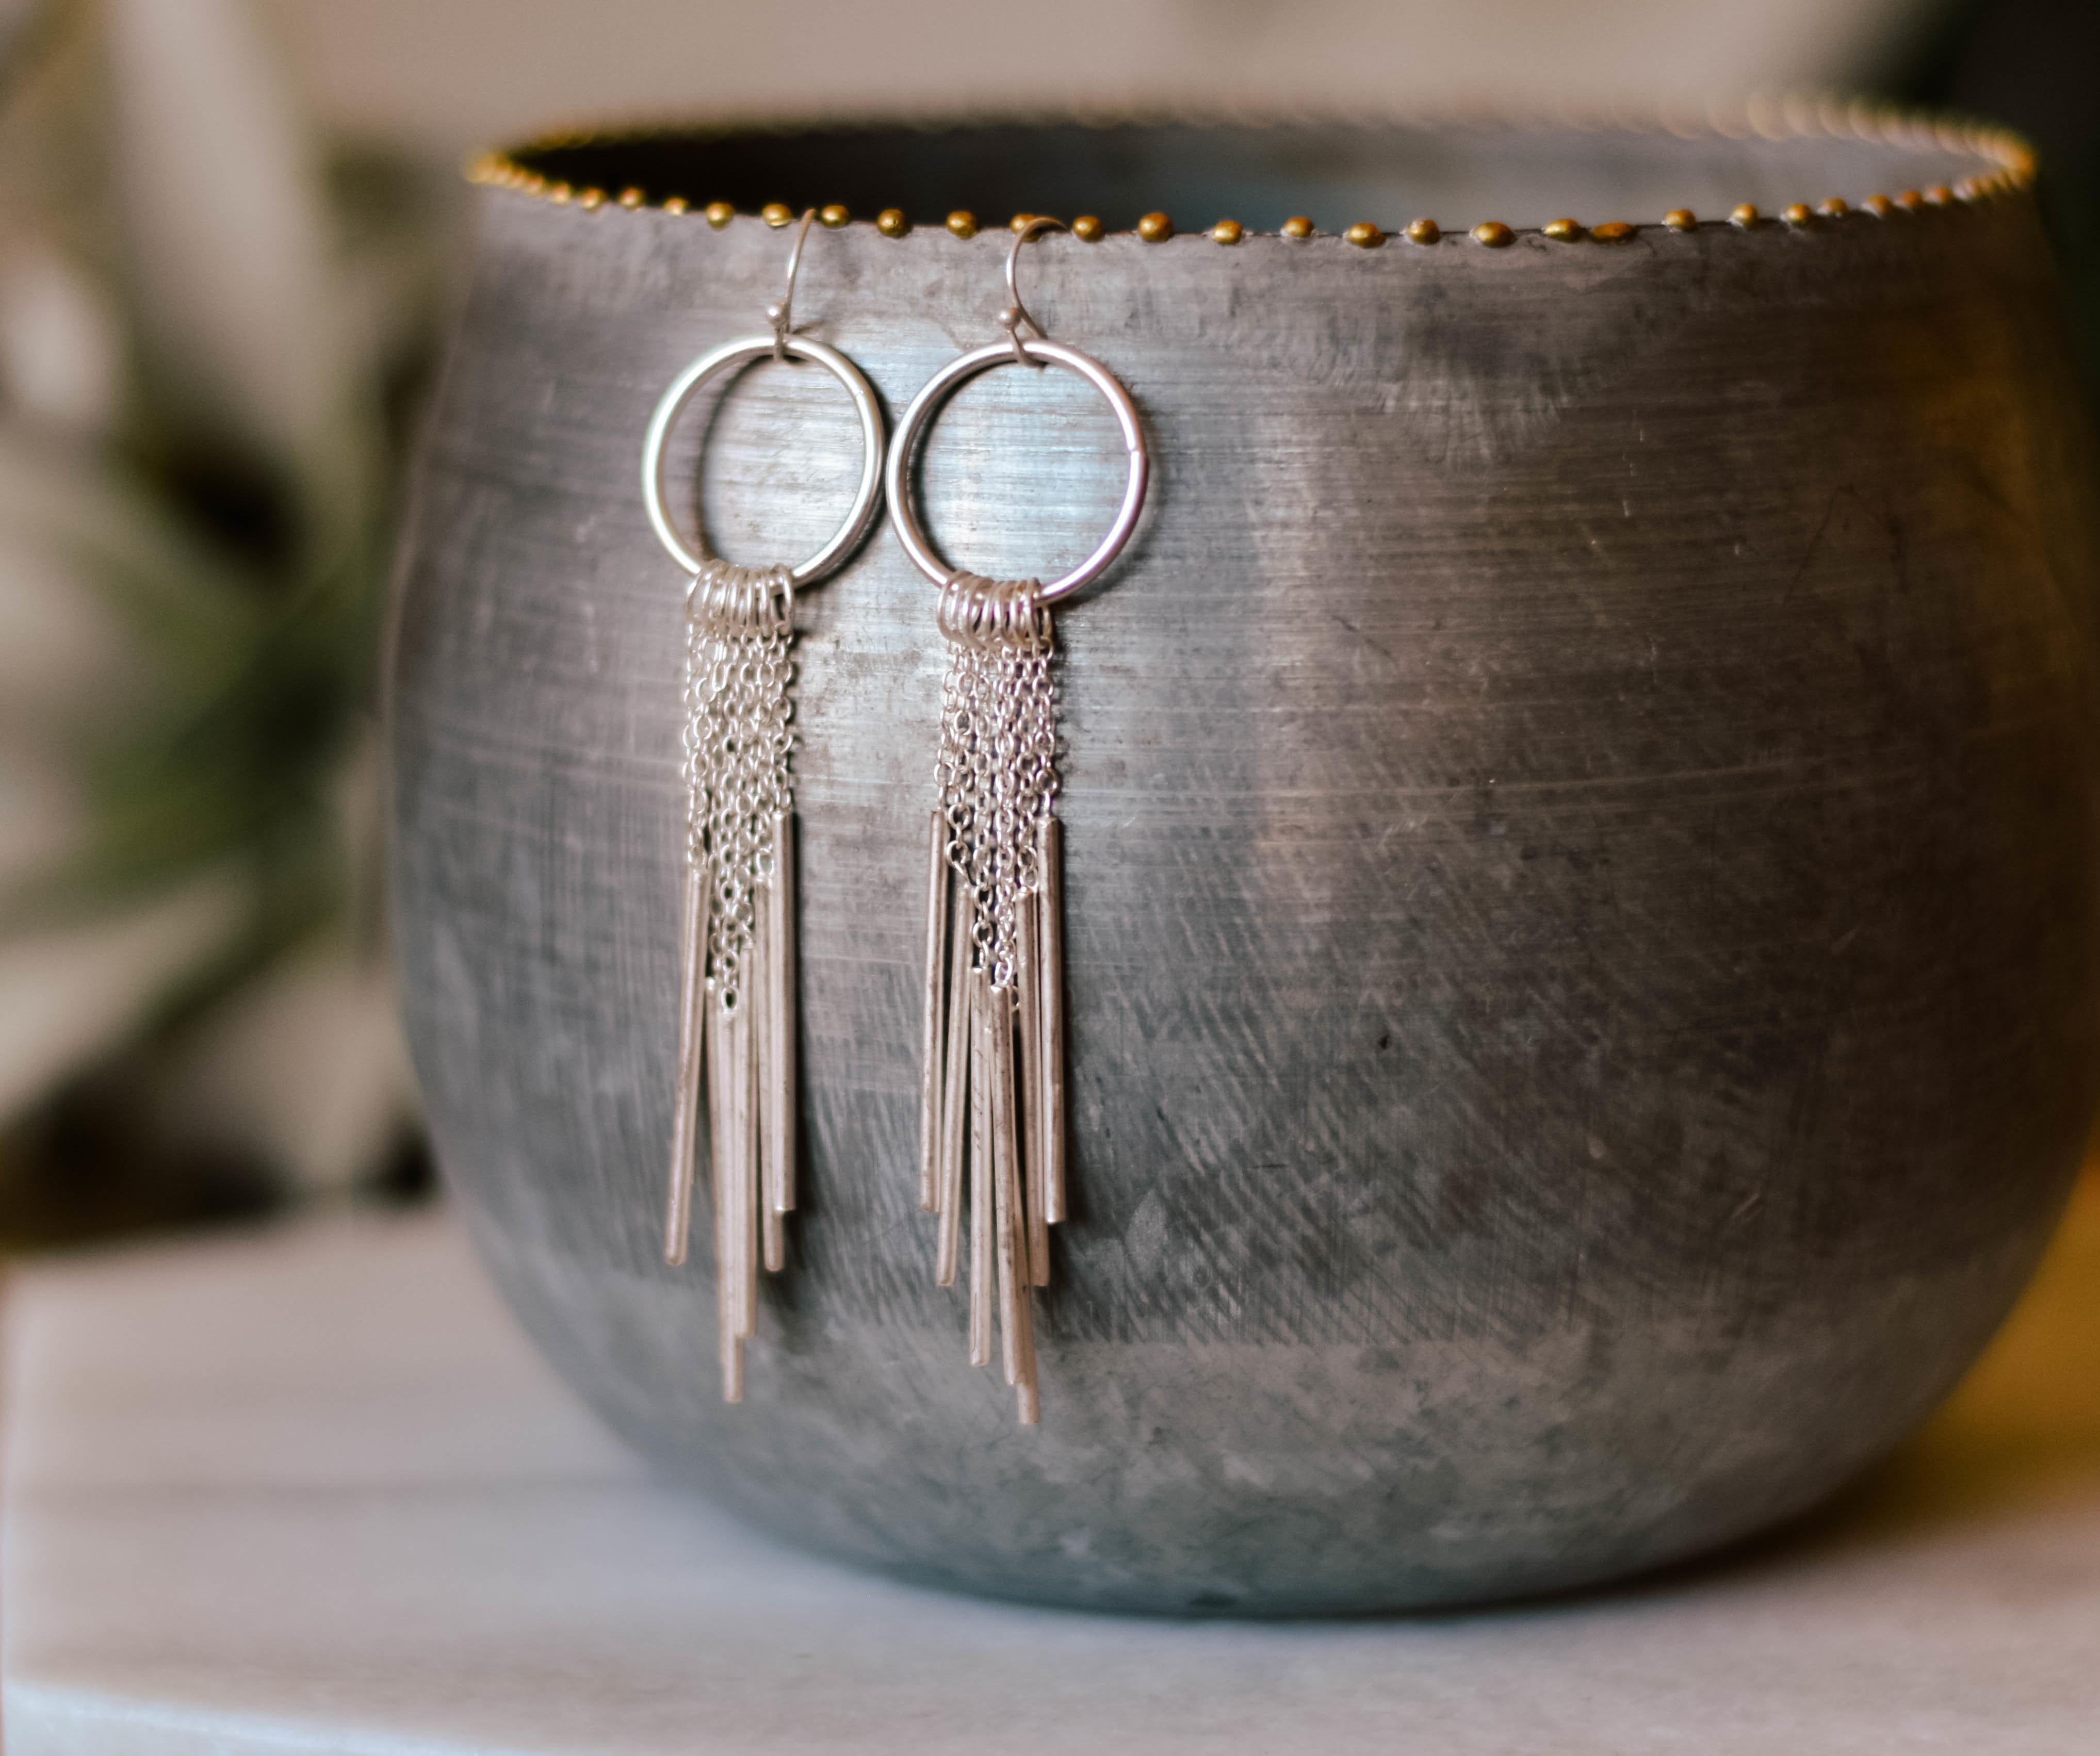 Fea Metal fringe earrings 14310 0Q9KXAWVK58PP